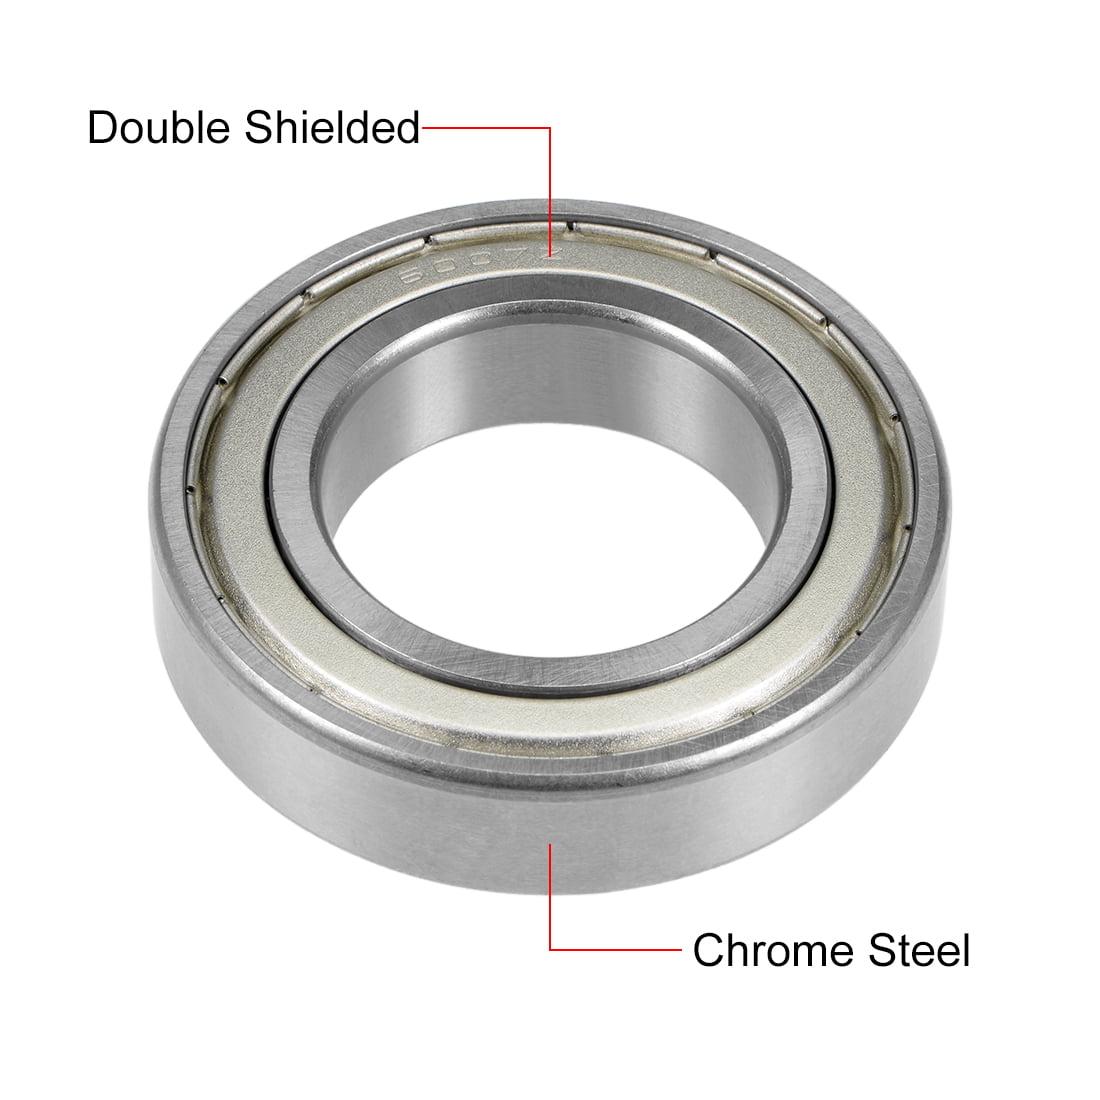 6007ZZ Deep Groove Ball Bearing 35x62x14mm Double Shielded Chrome Bearings 1pcs - image 3 de 4